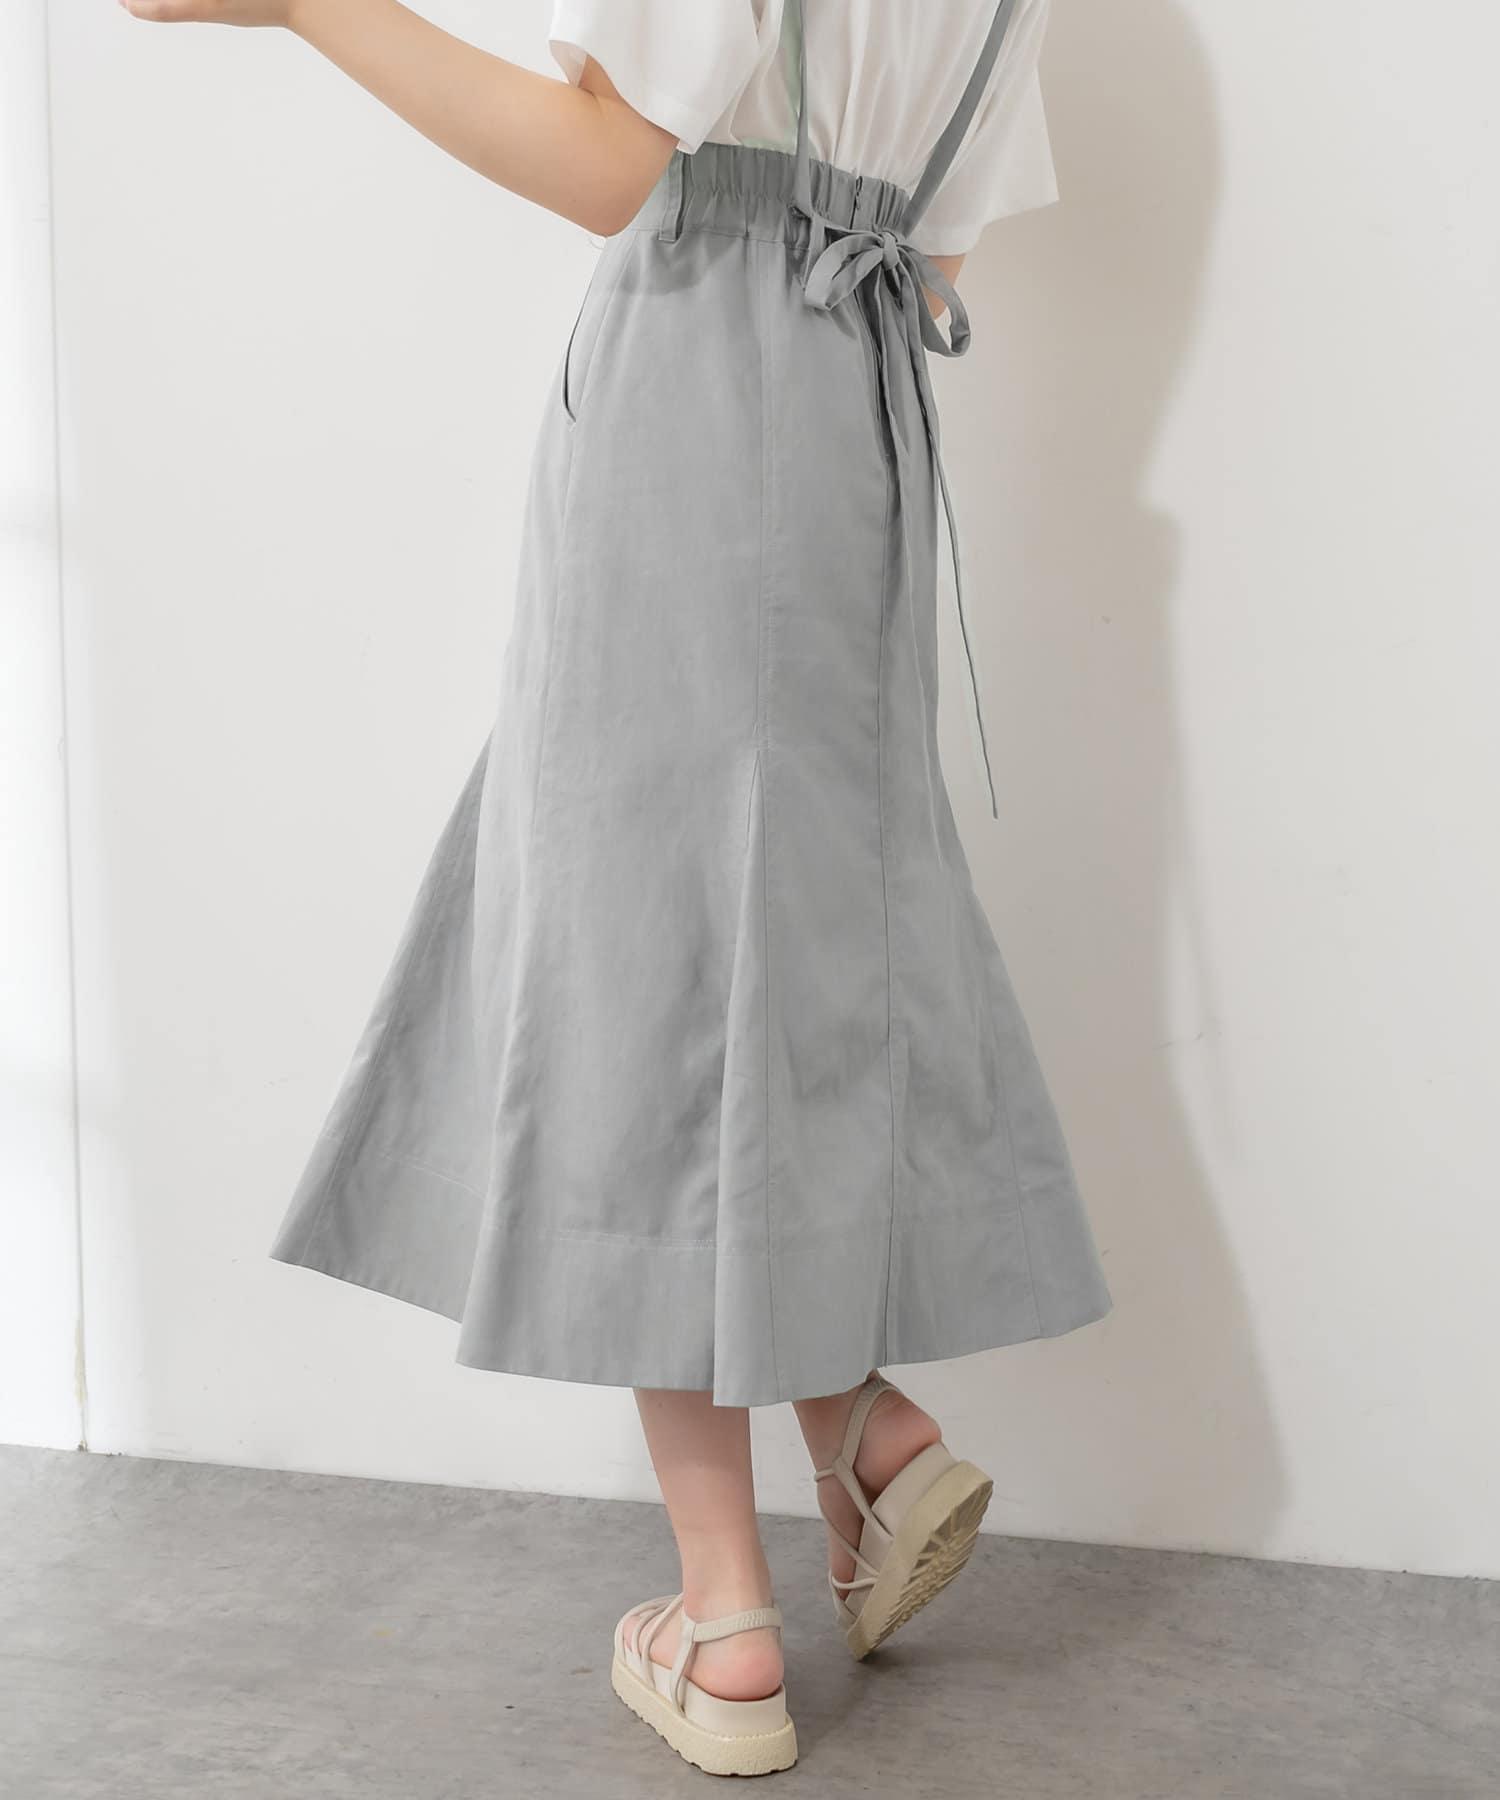 OLIVE des OLIVE(オリーブ デ オリーブ) 品良く決まるサス付マーメイドスカート